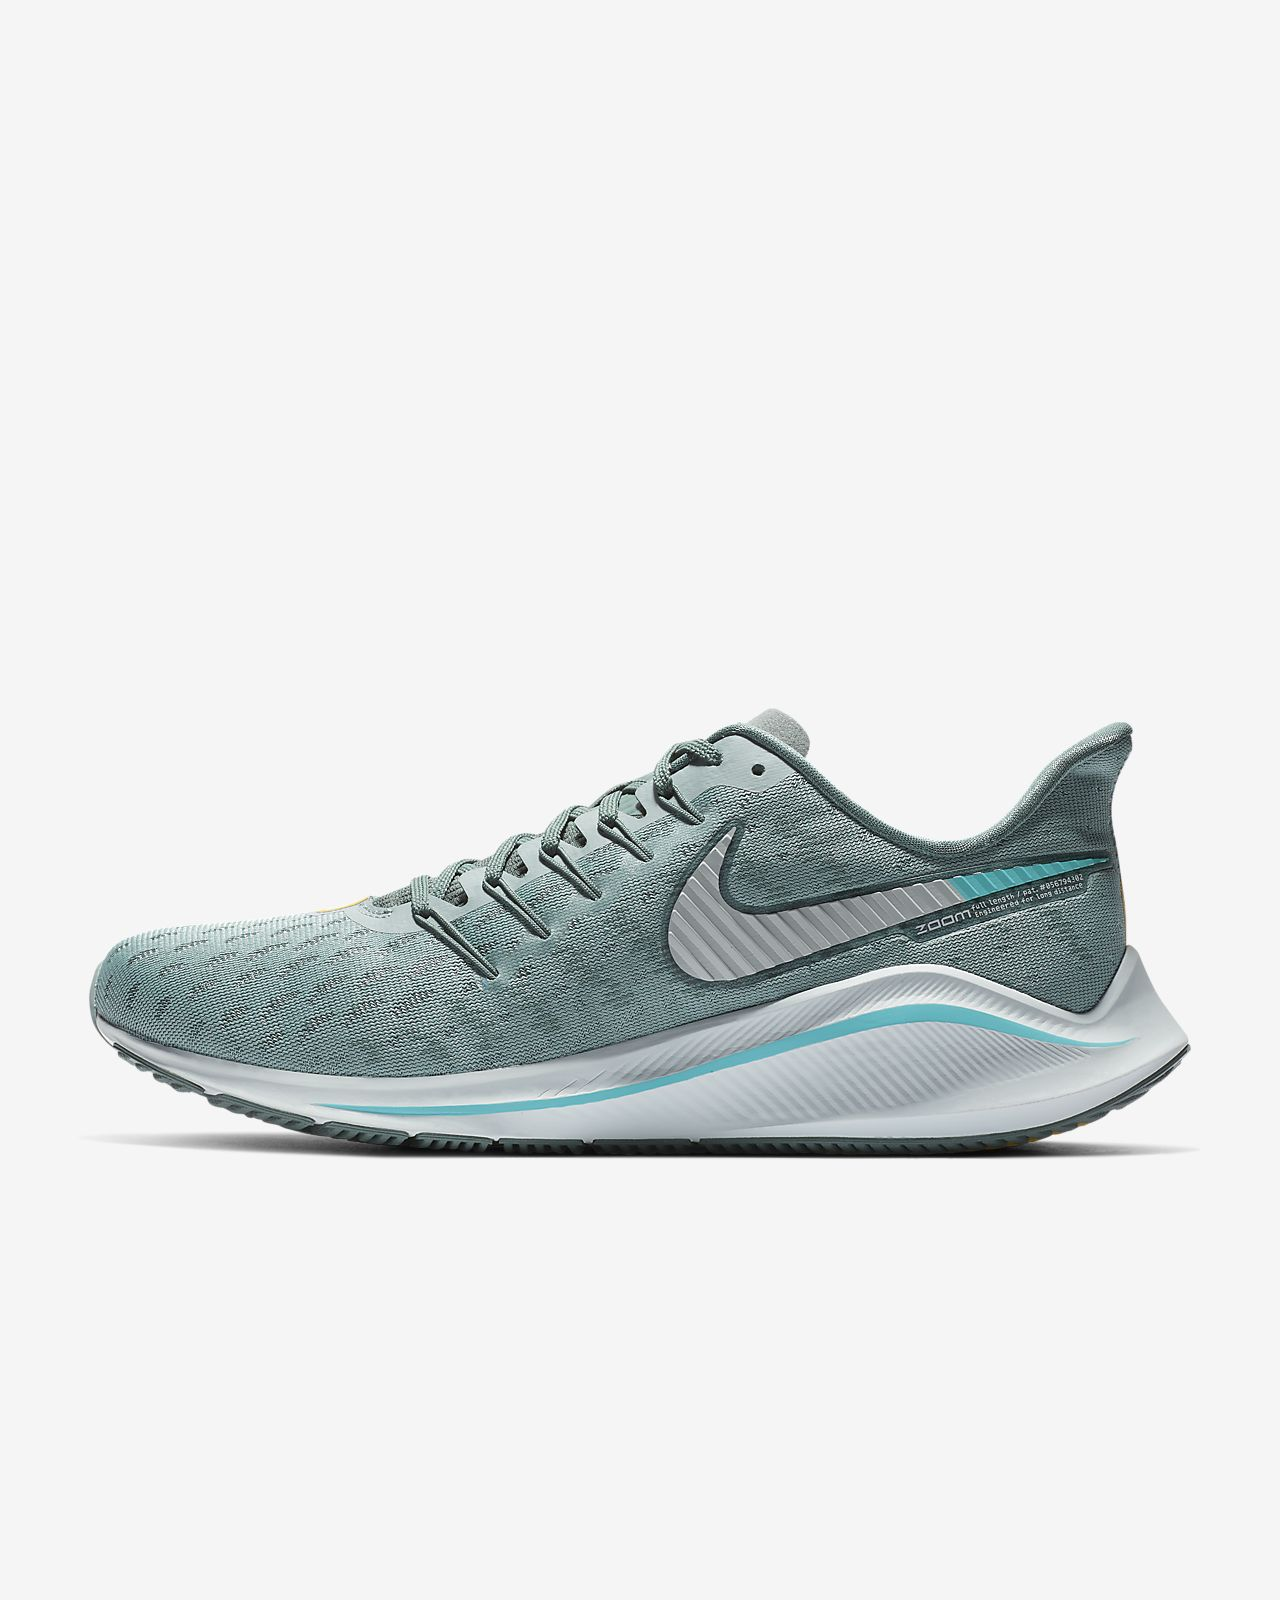 Nike Air Zoom Vomero 14 Men s Running Shoe. Nike.com GB 6b8a4fe47